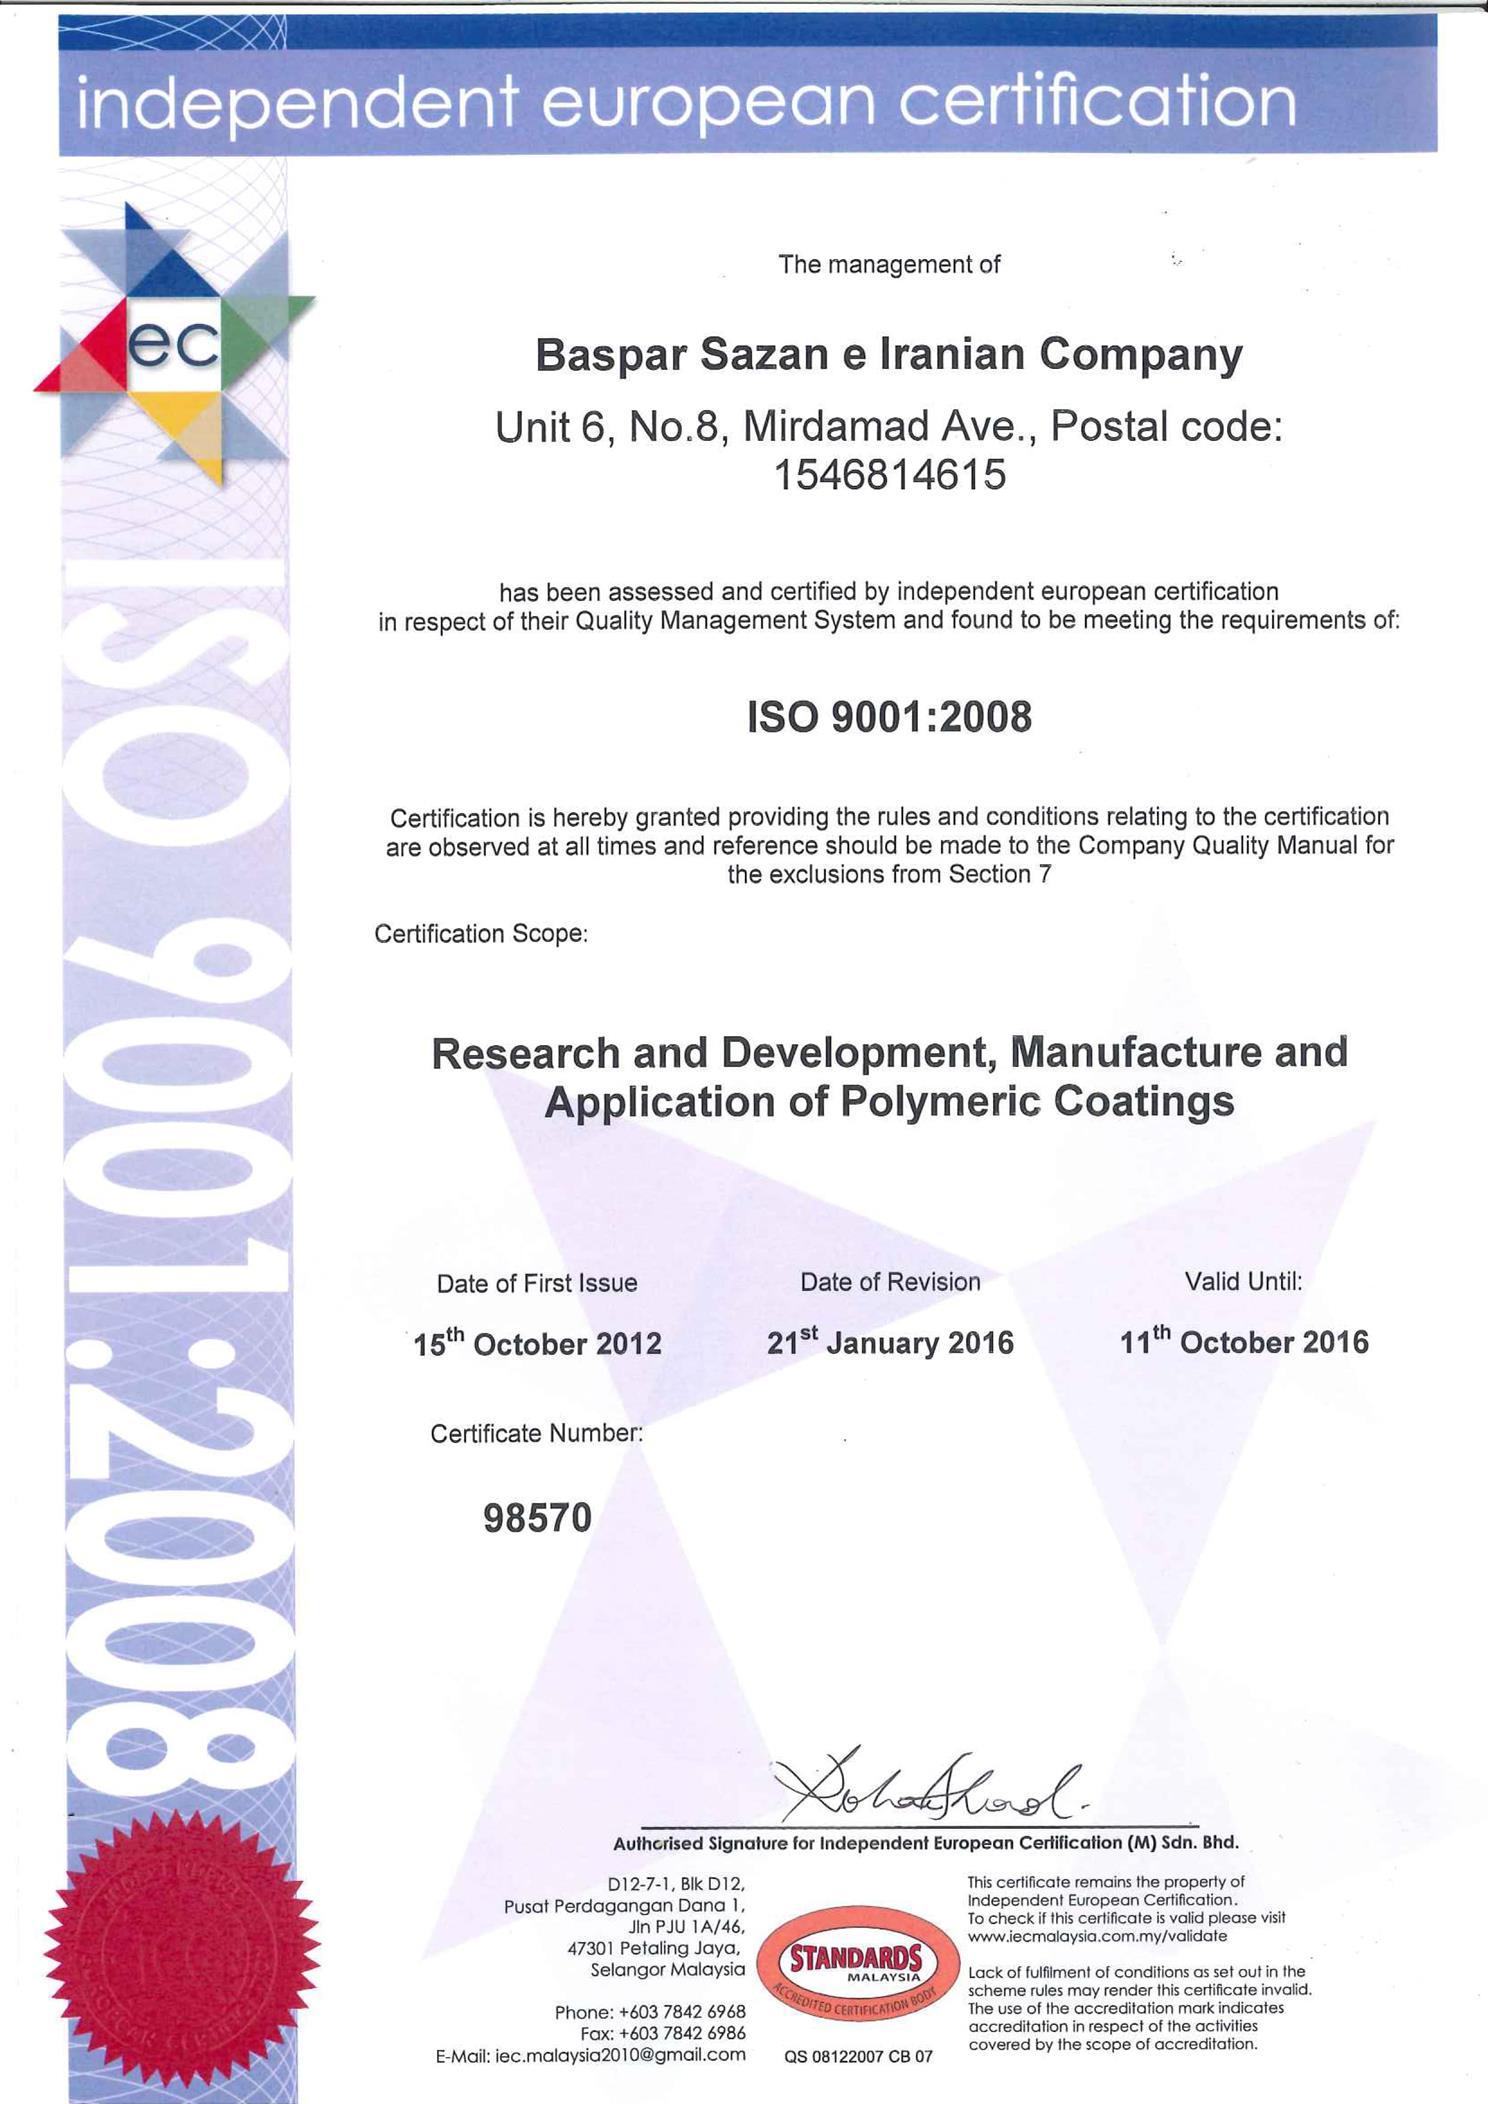 گواهی ISO 9001:2008